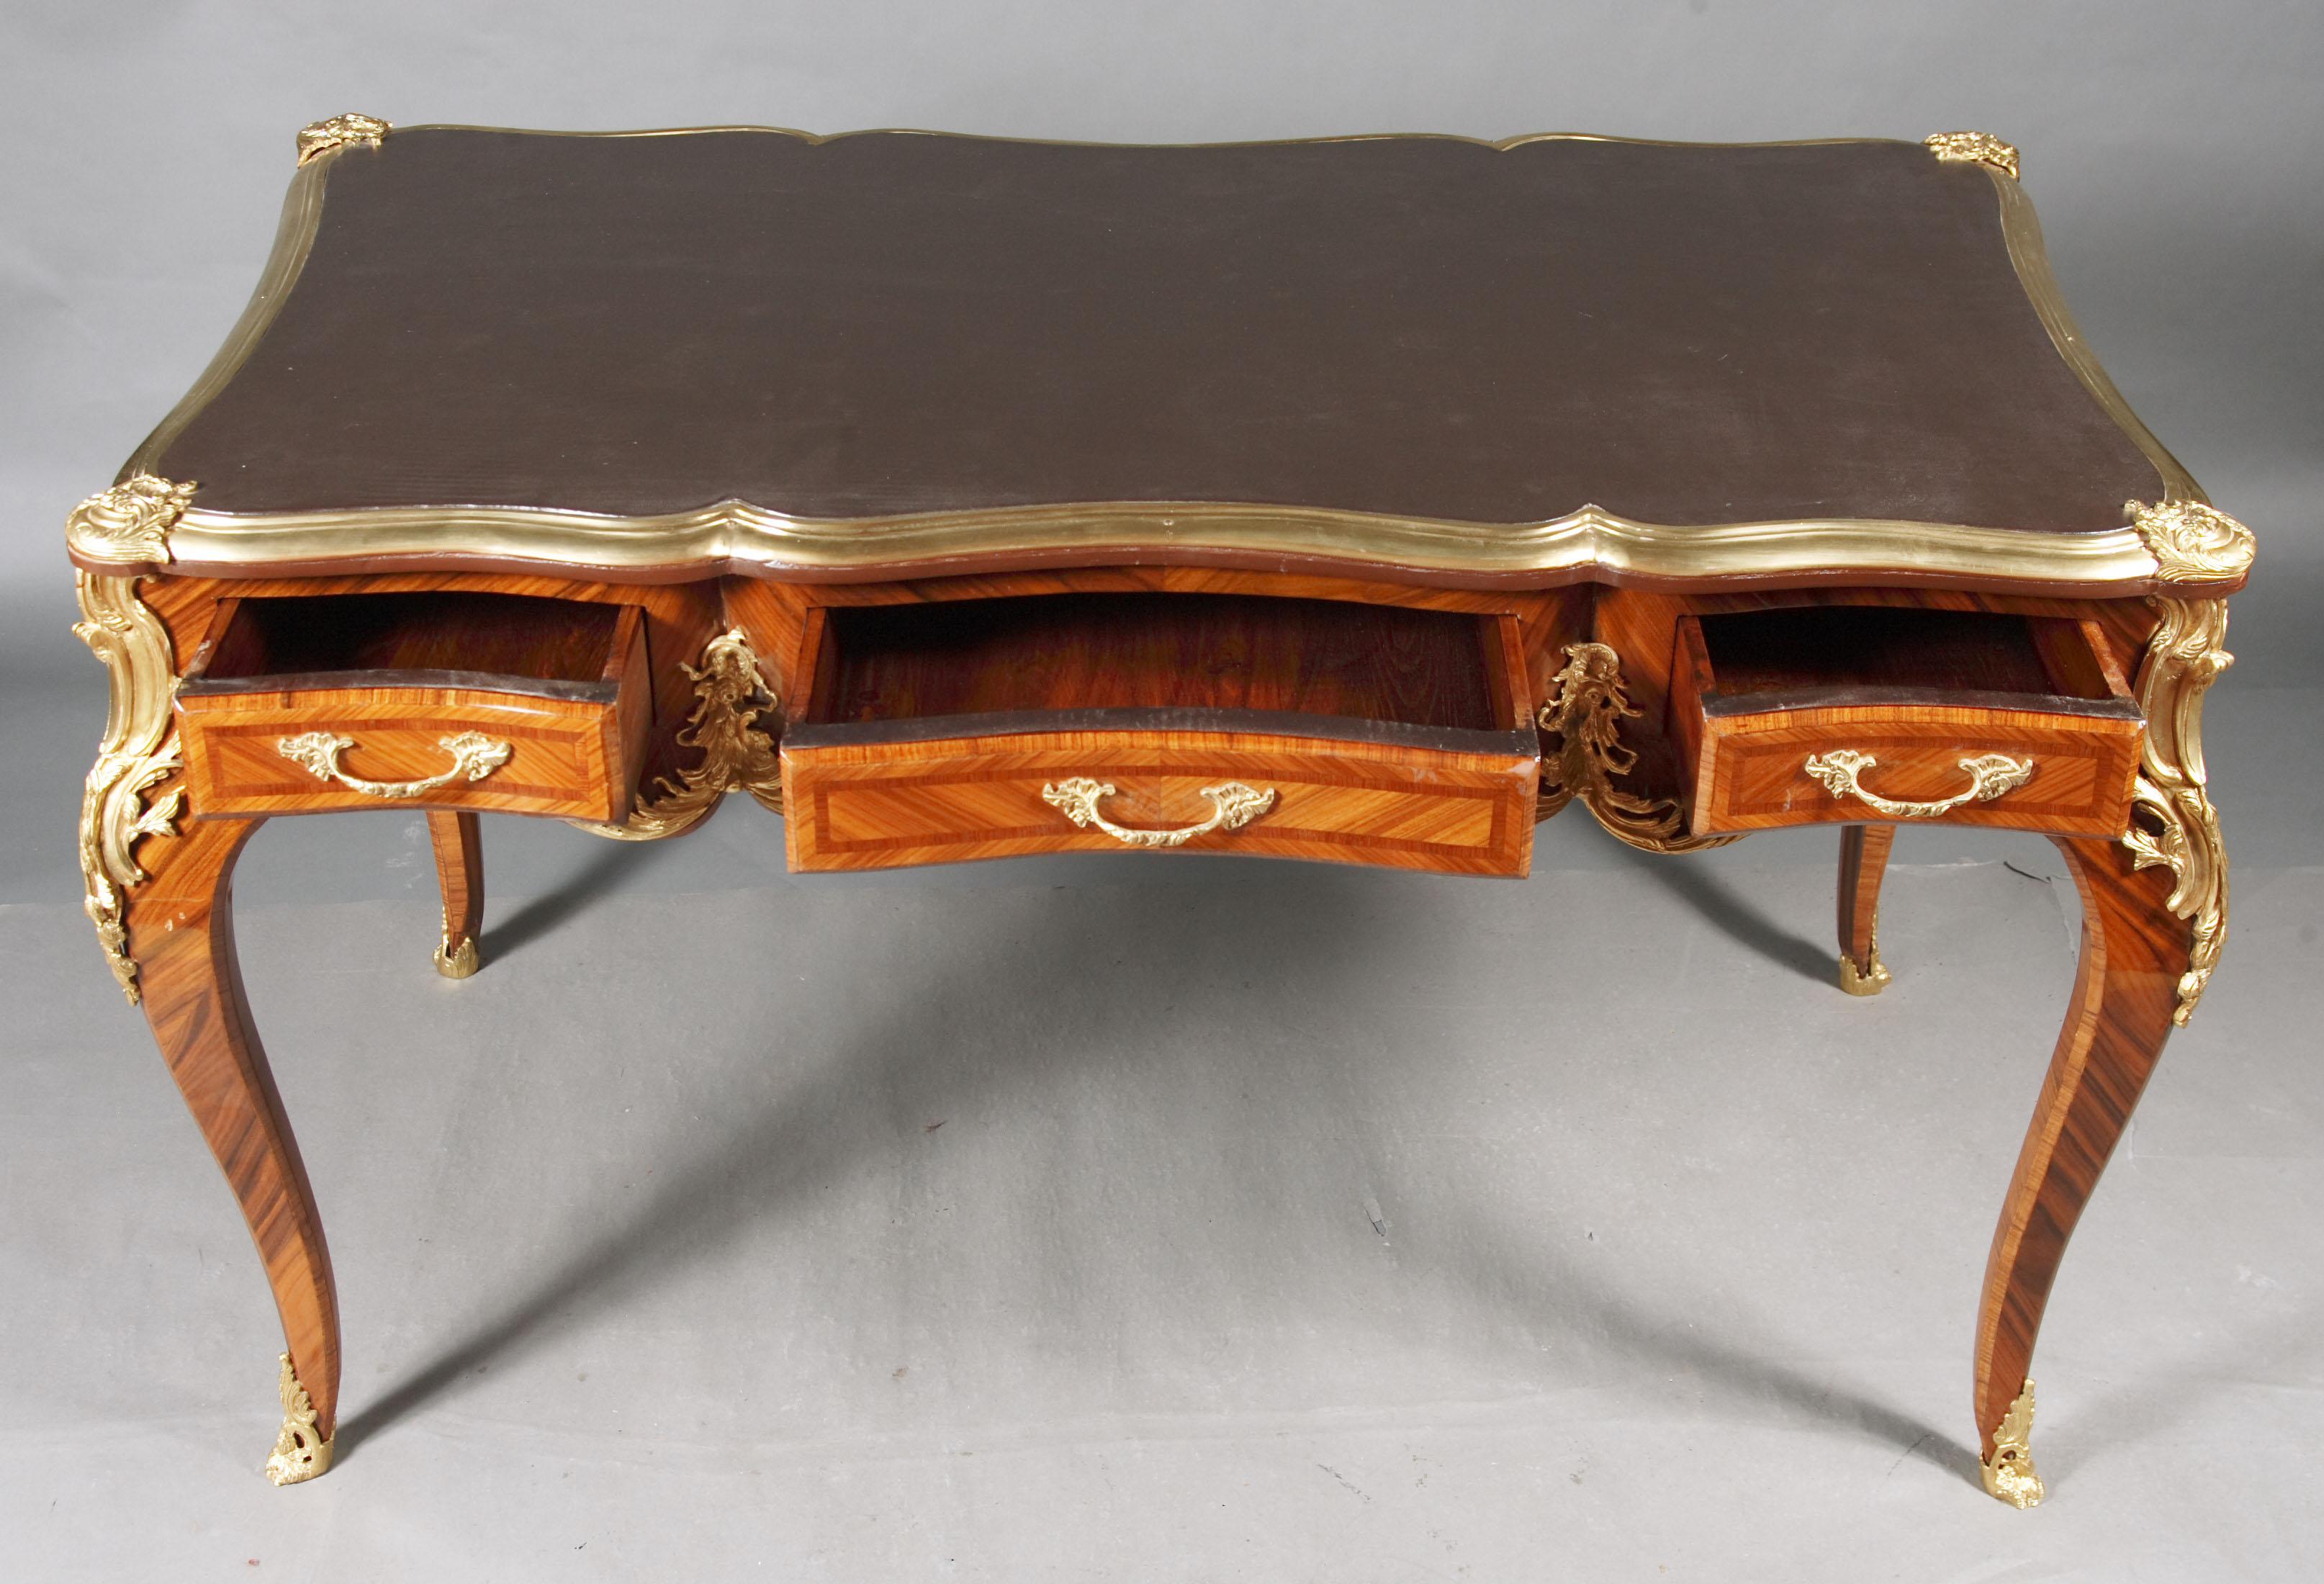 desk bureau plat in the louis xv style ebay. Black Bedroom Furniture Sets. Home Design Ideas